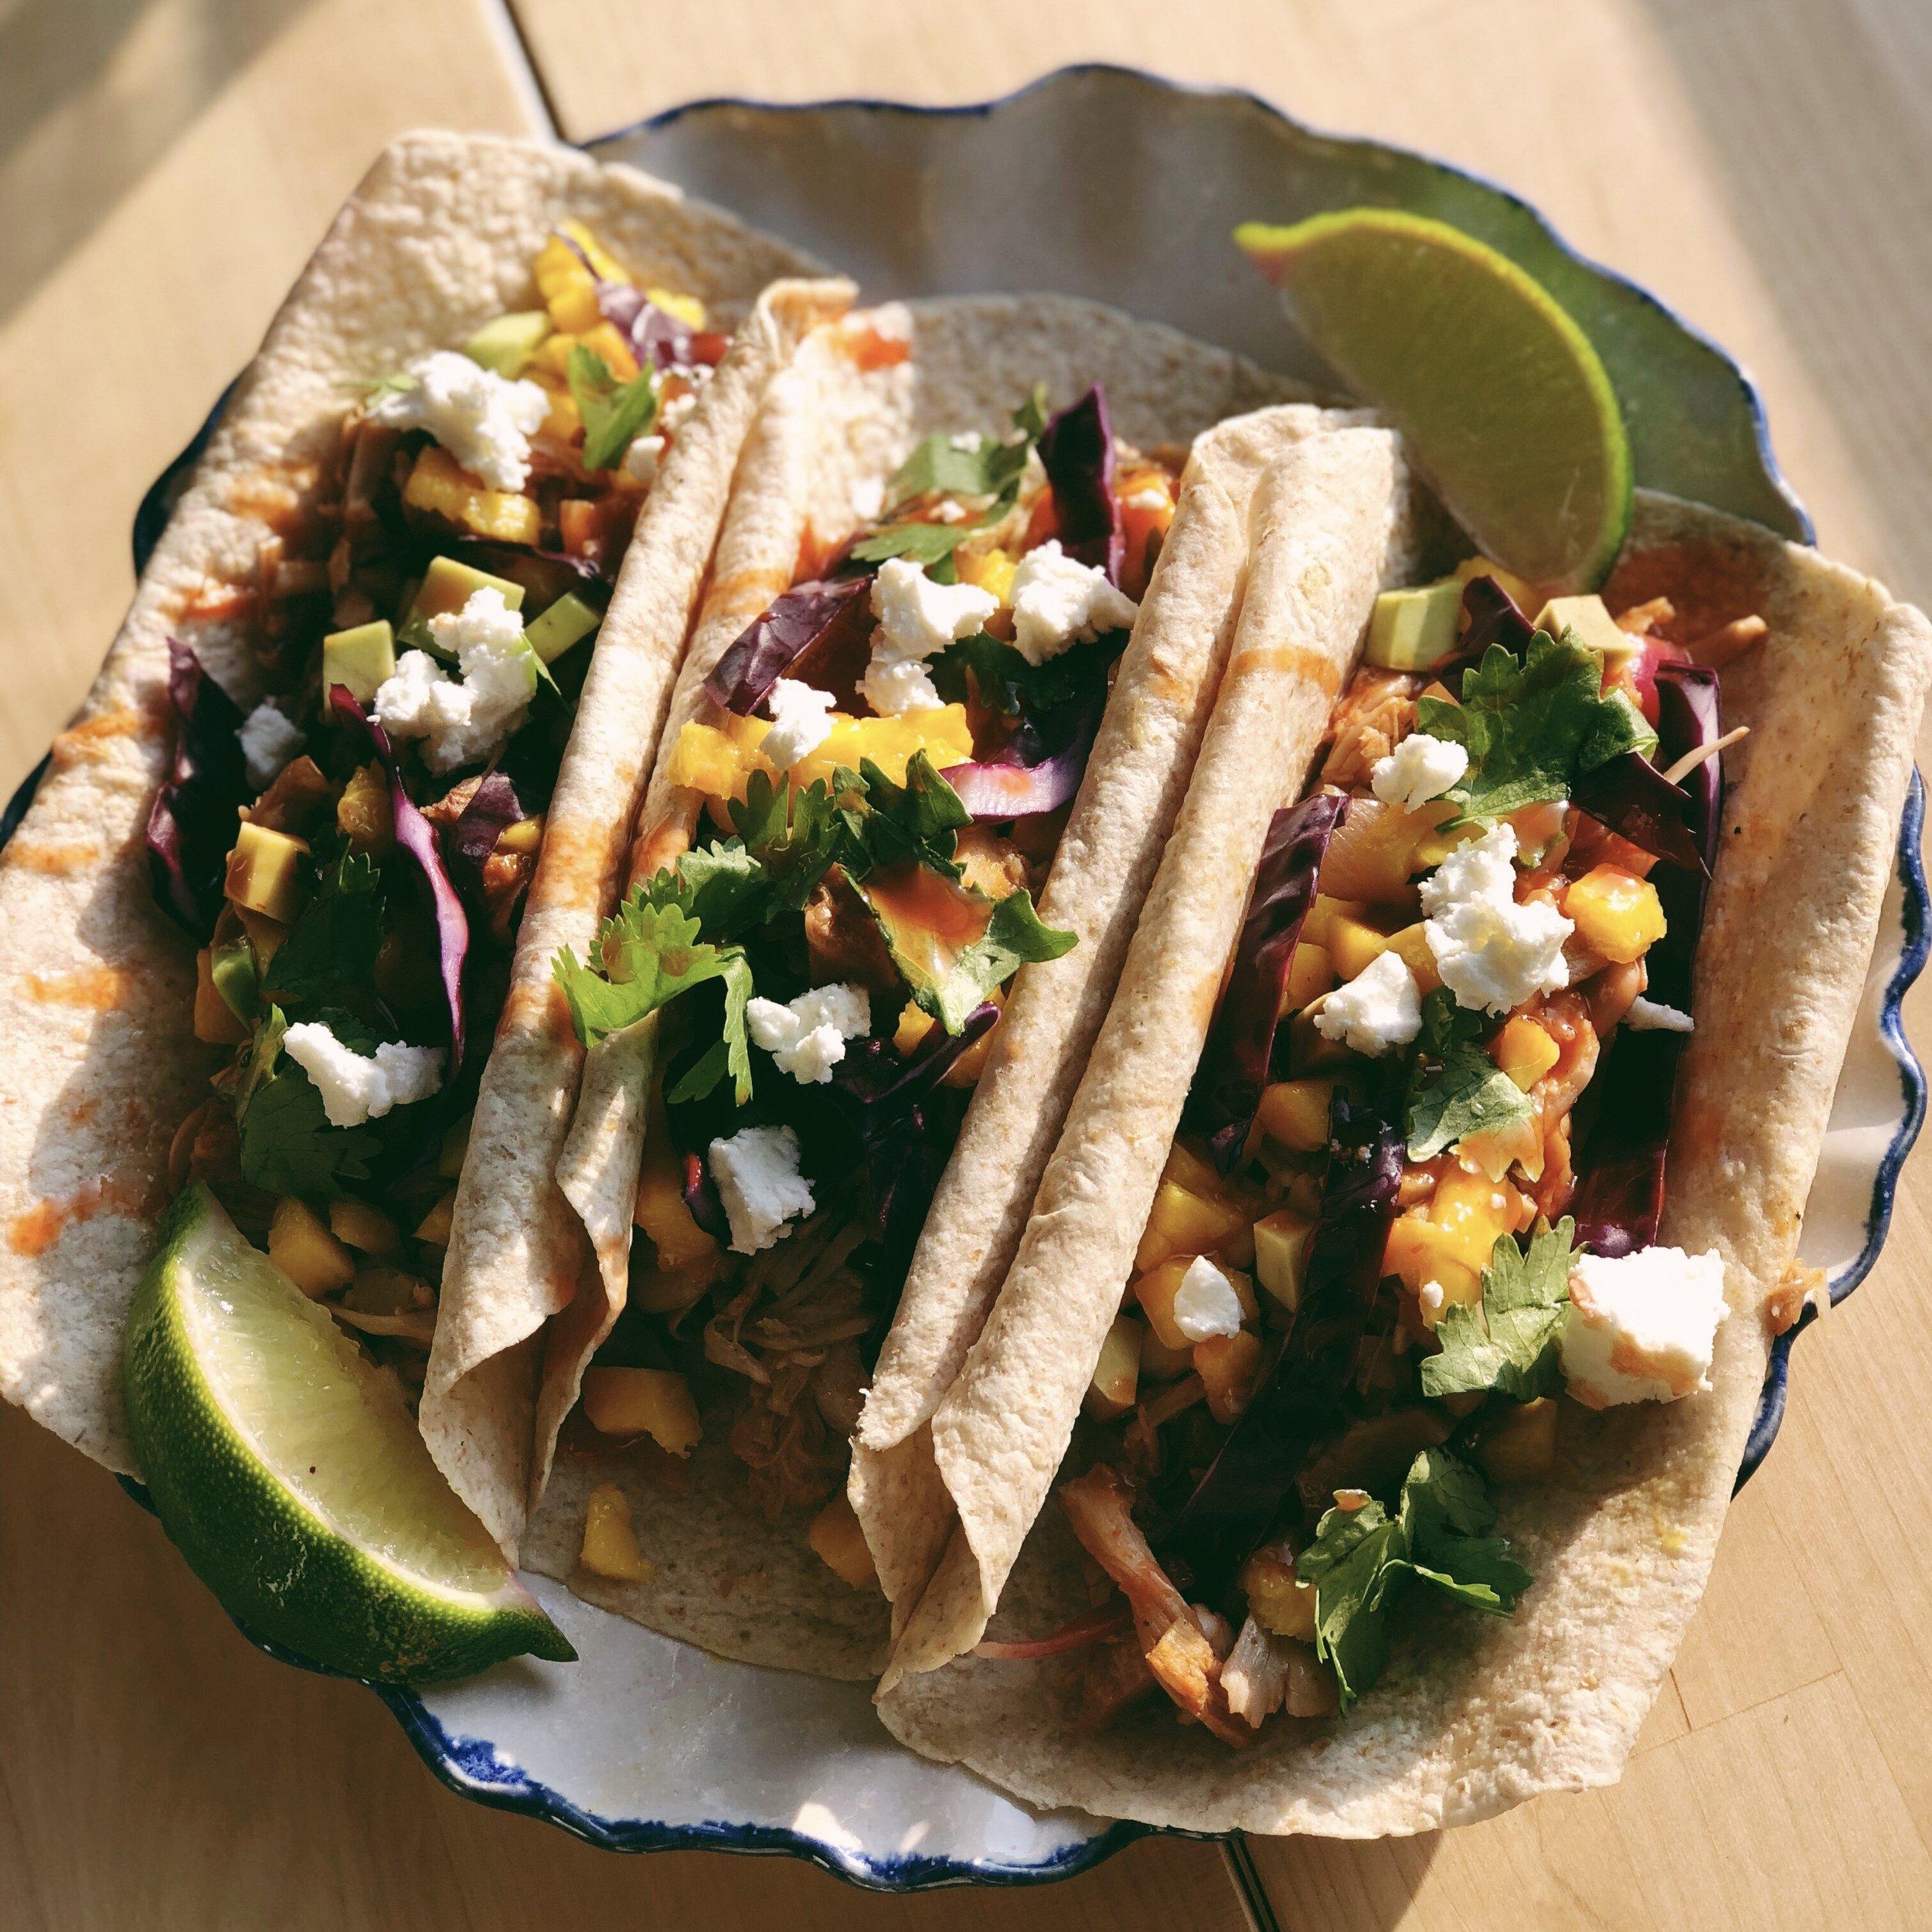 Don't Be a Jerk Jackfruit Tacos